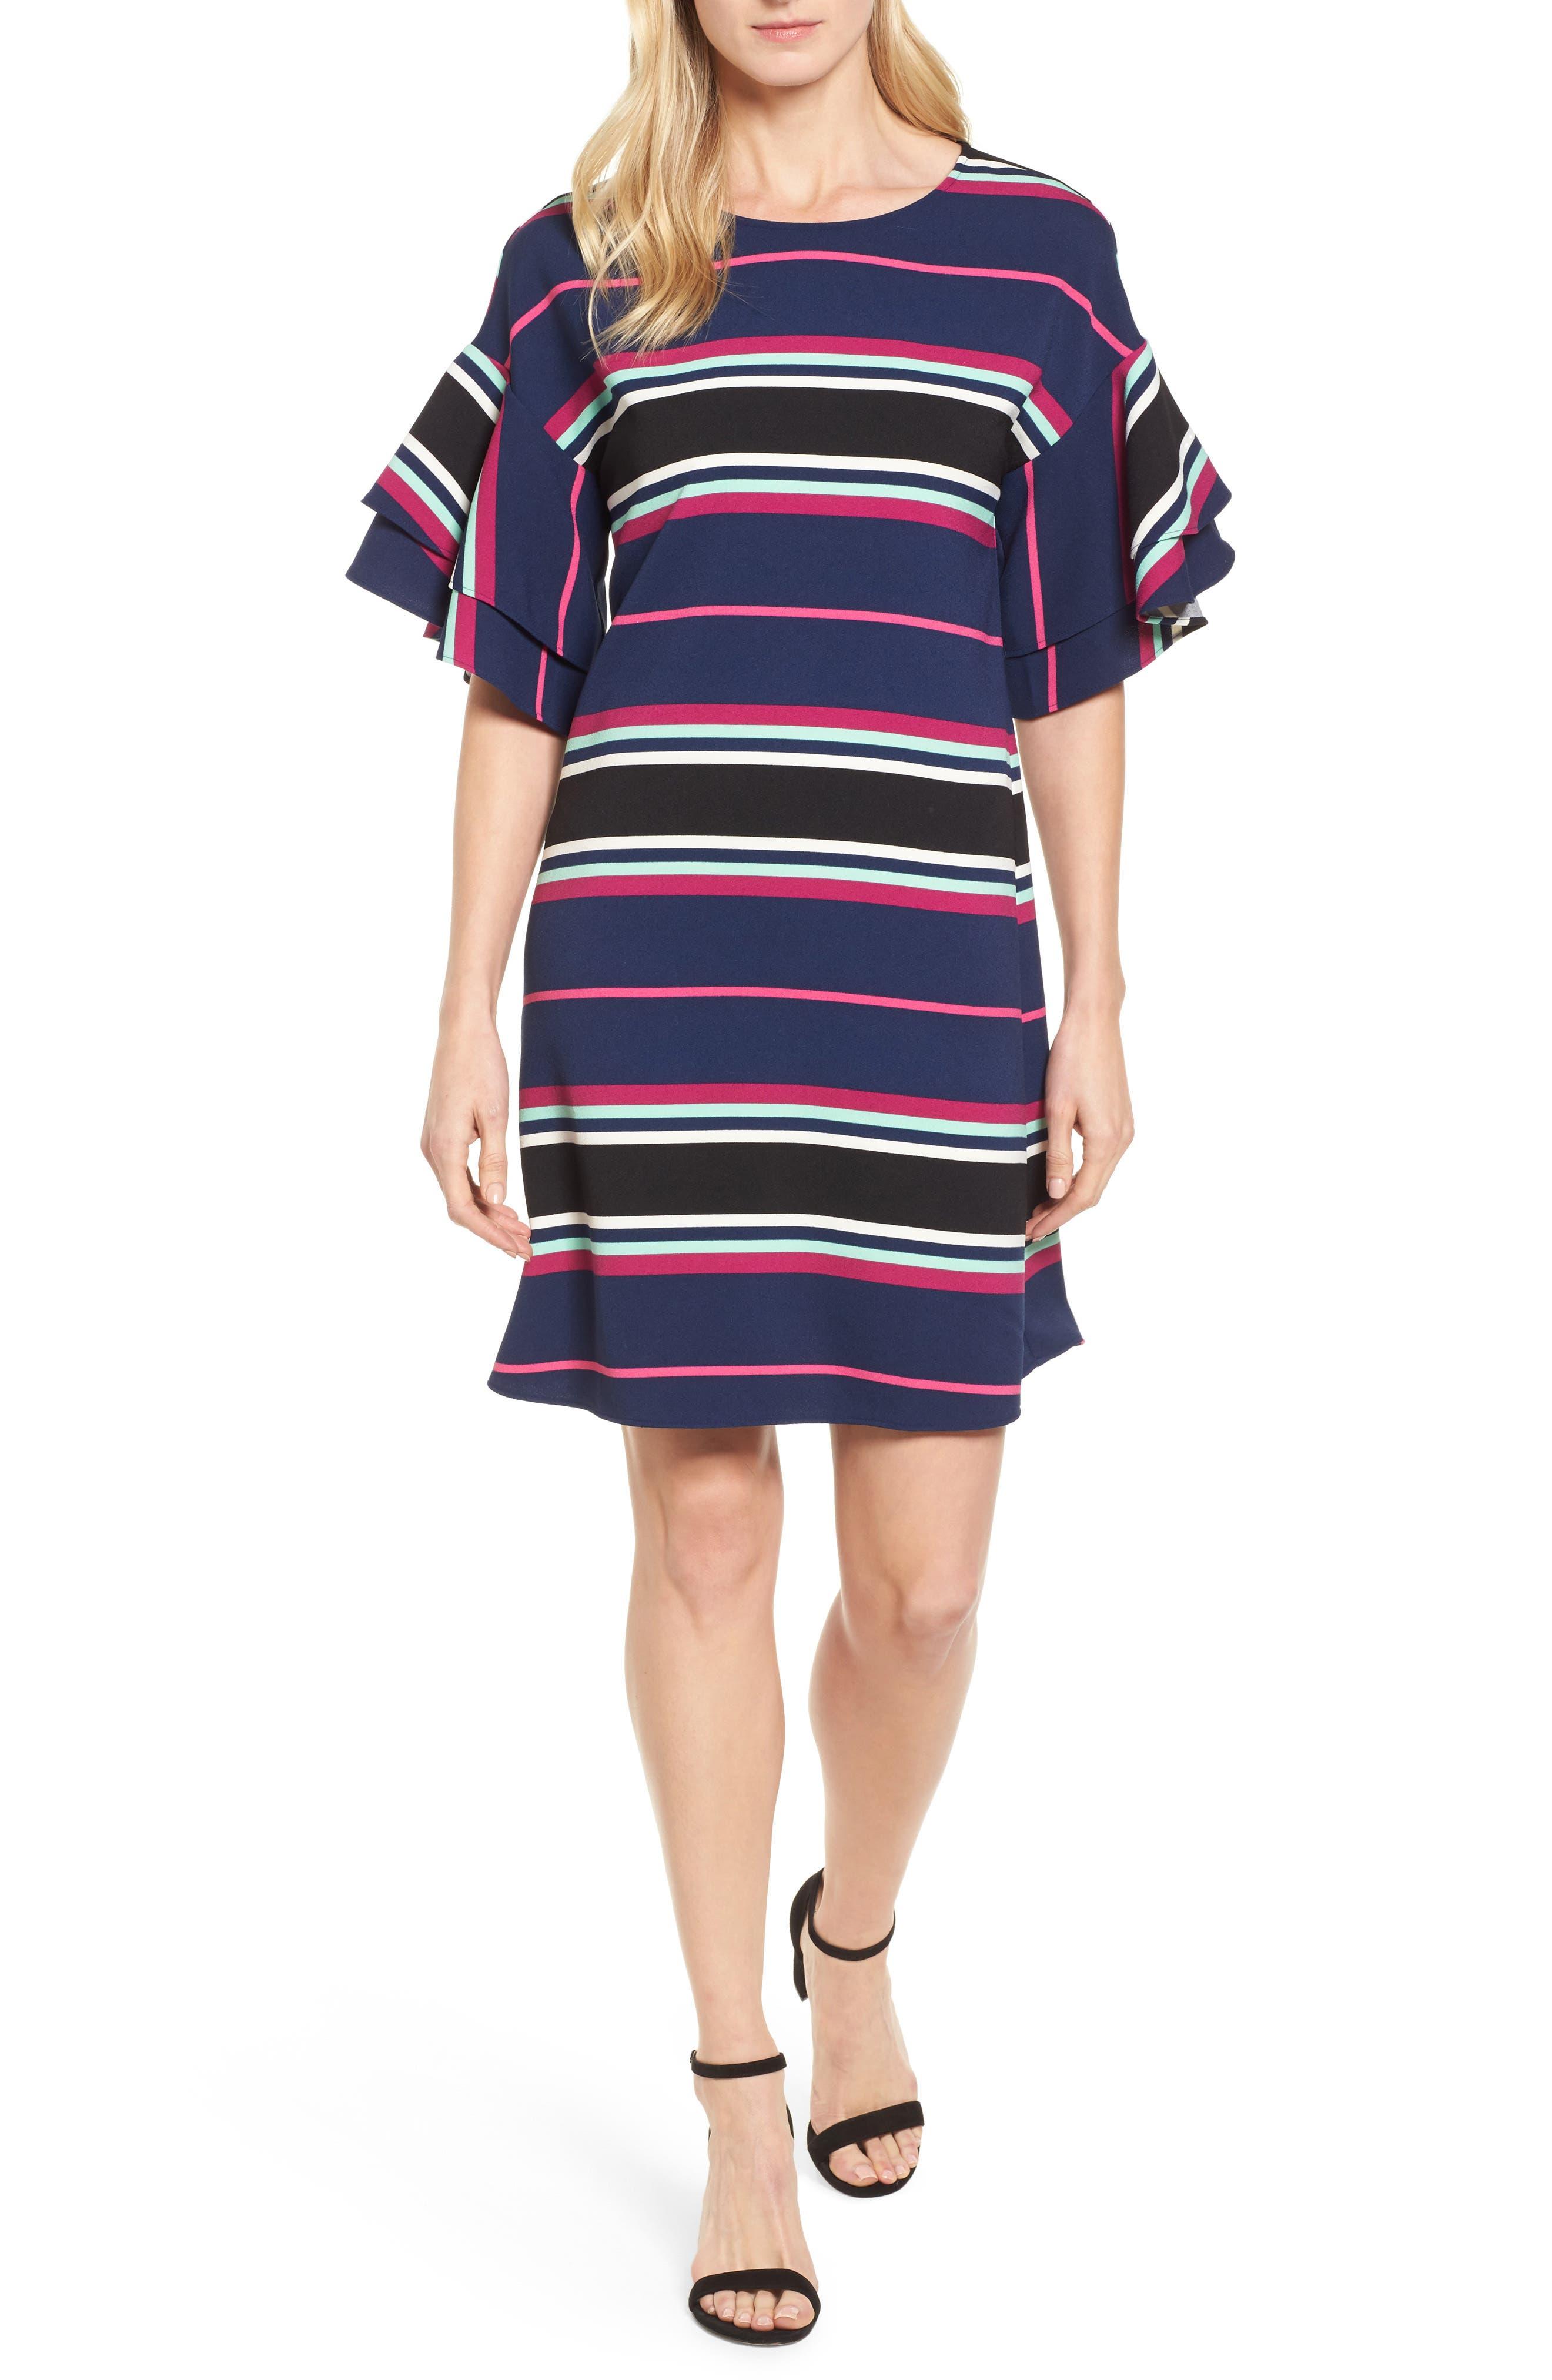 Ruffle Sleeve Shift Dress,                         Main,                         color, Navy- Pink Multi Stripe